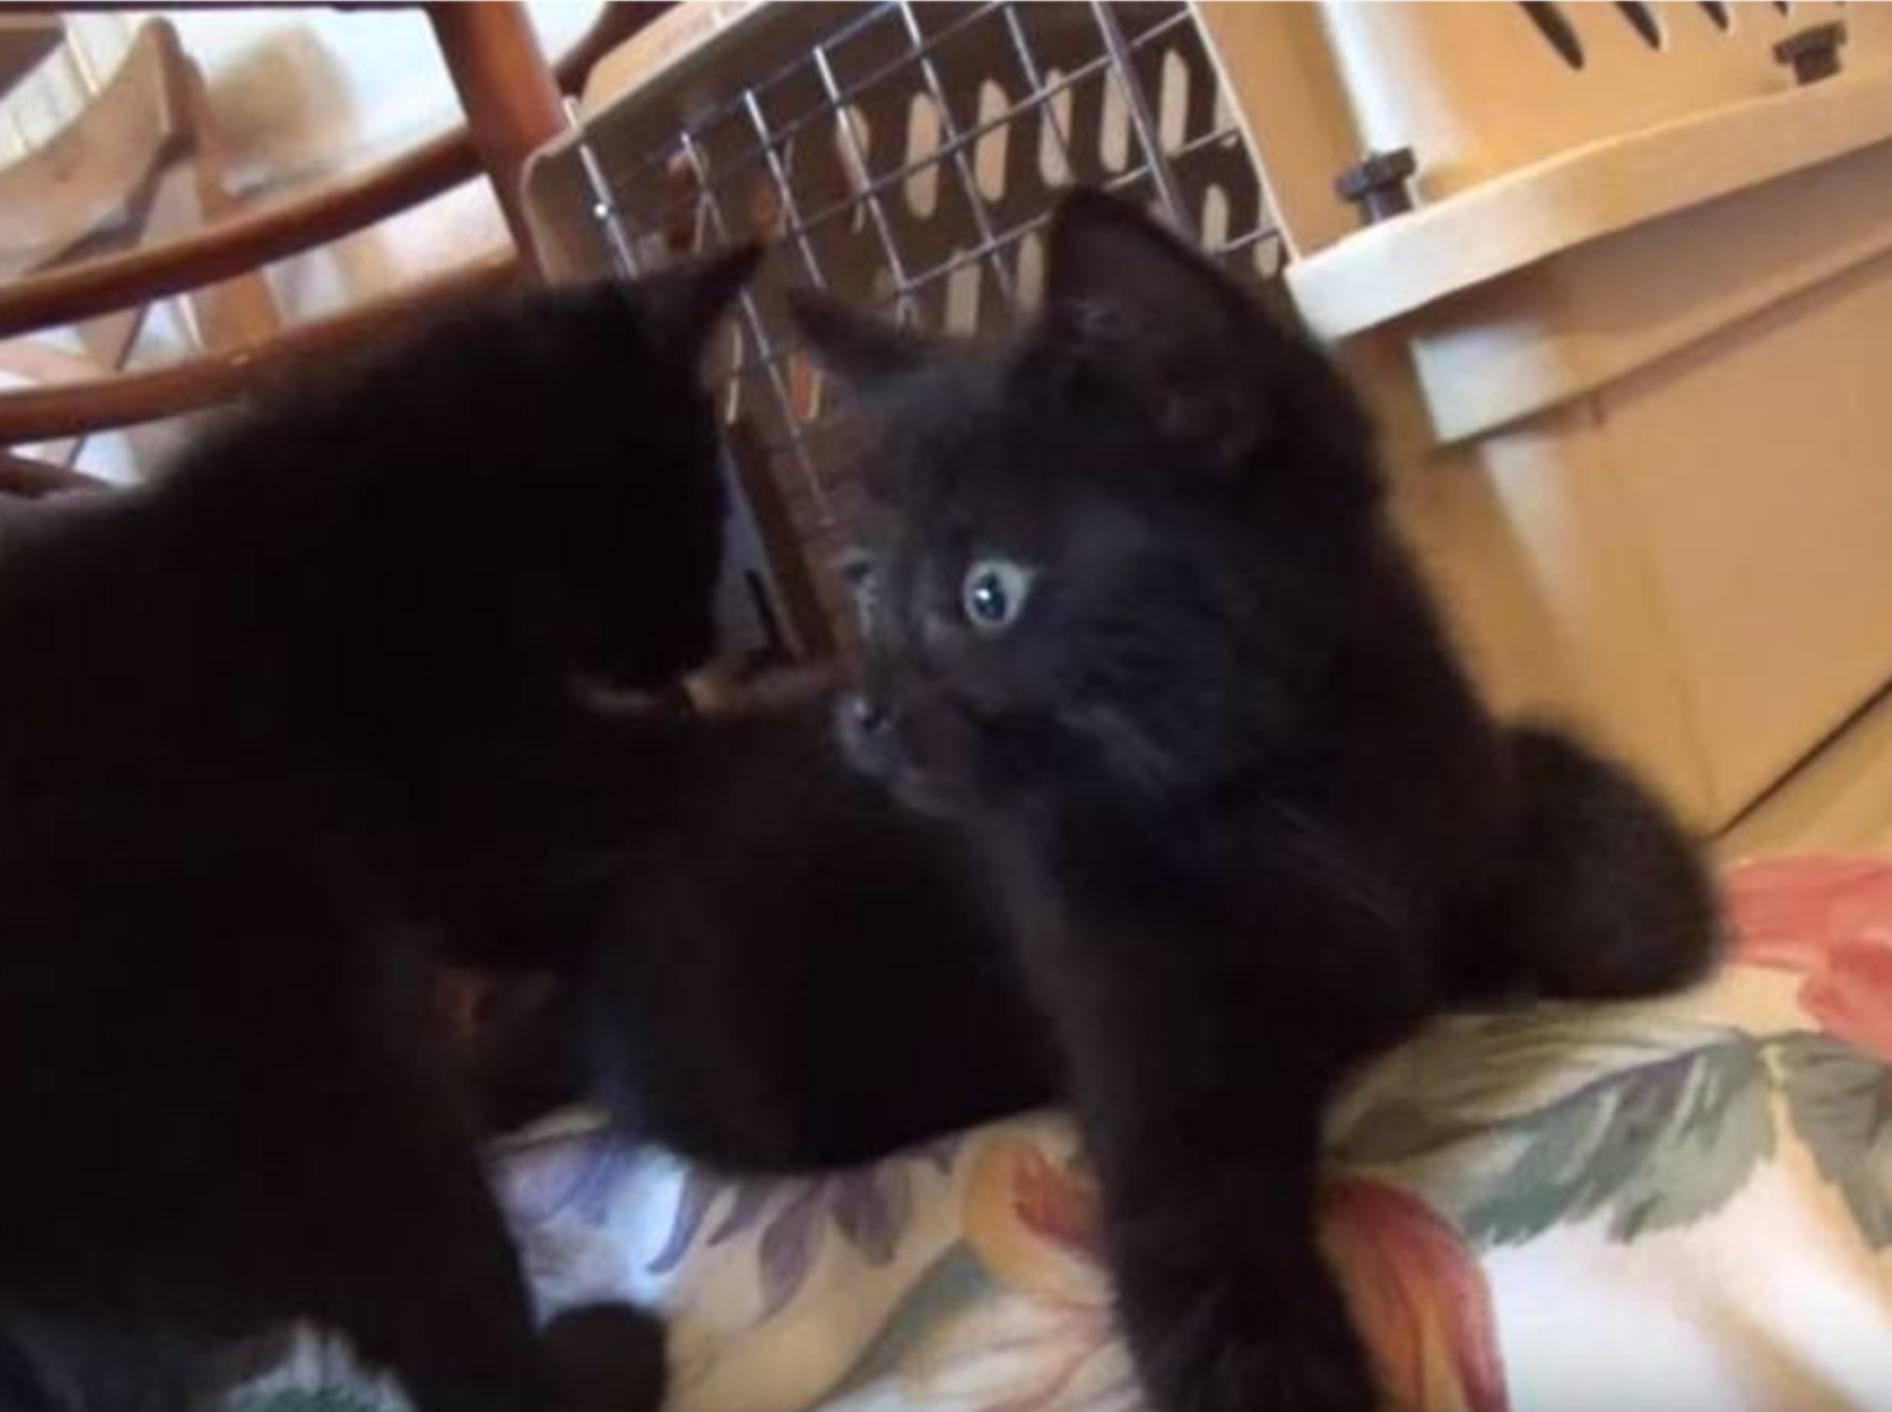 Die Katze als Hunde-Imitator. Wetten, dass niemand drauf reinfällt – YouTube / The Kits Cats